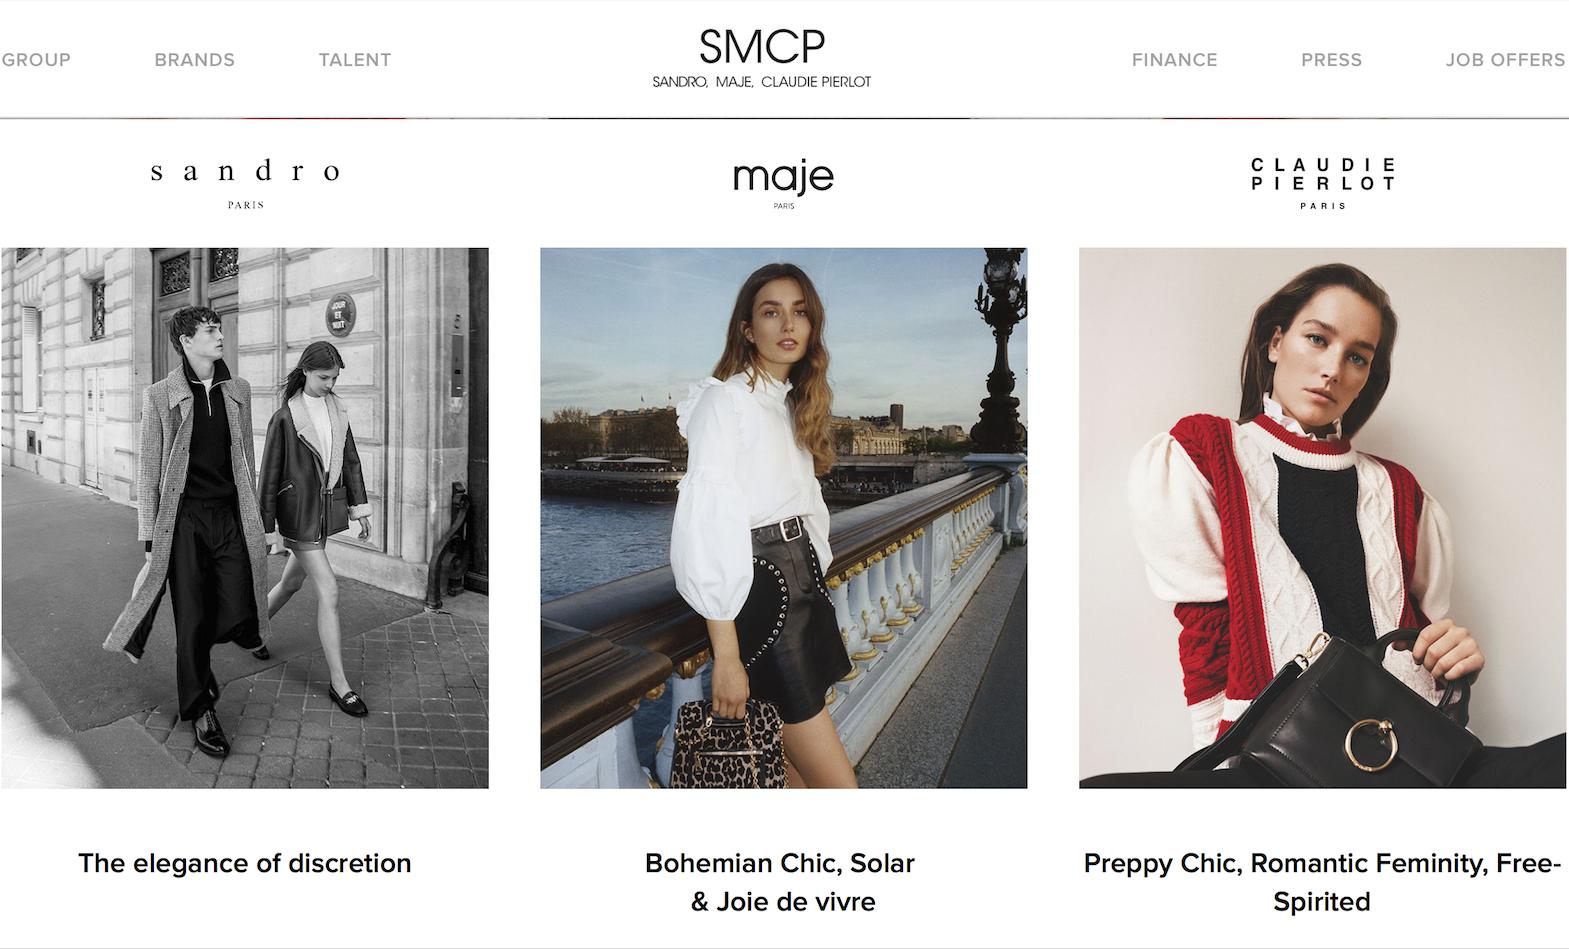 Sandro和Maje的母公司,法国时尚集团SMCP公布上市后首份季报:销售同比增长17.7%,目标全年销售9亿欧元